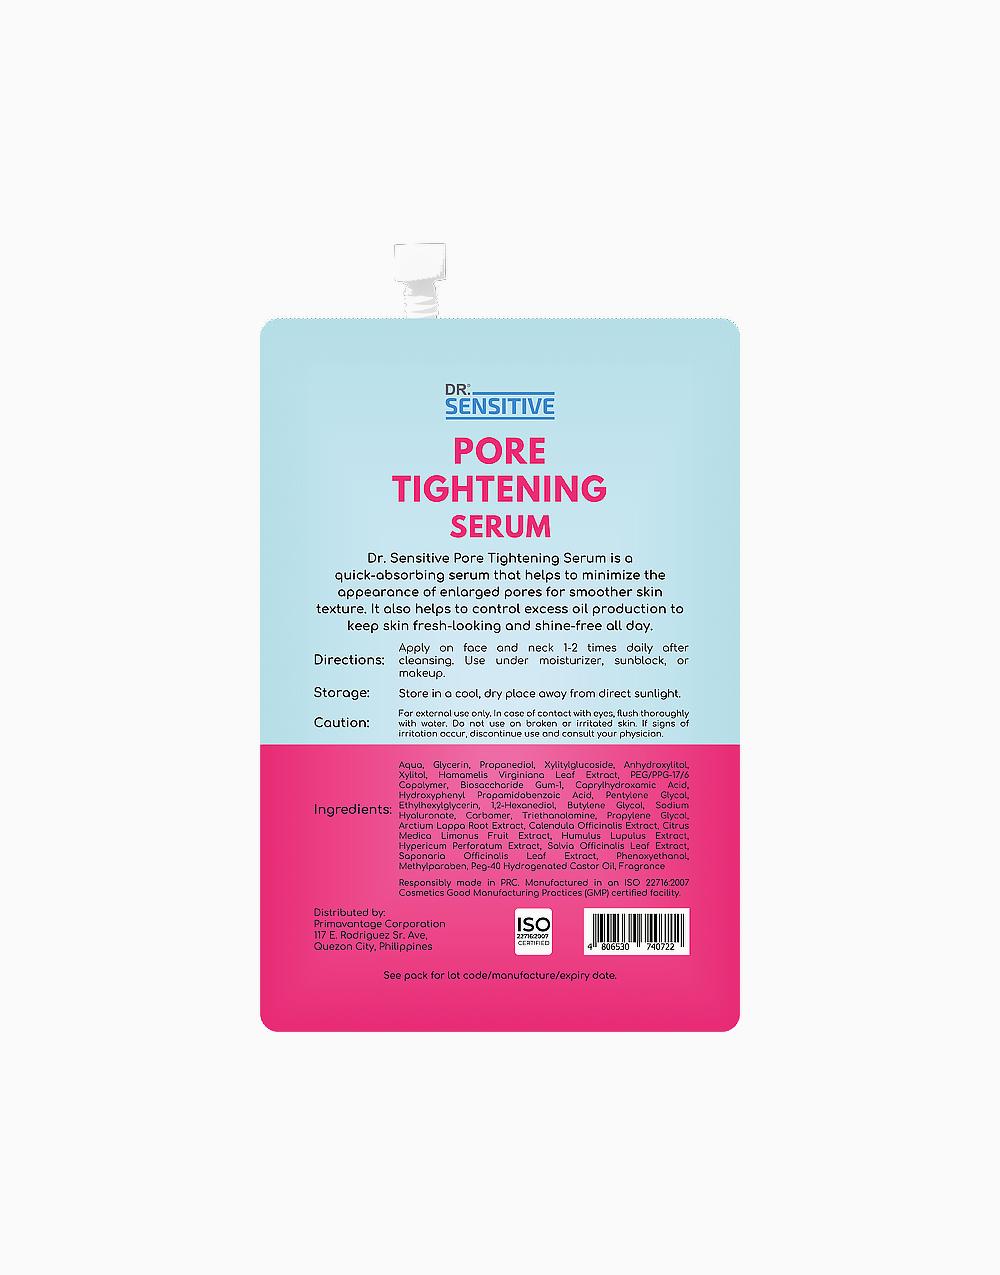 Pore Tightening Serum by Dr. Sensitive